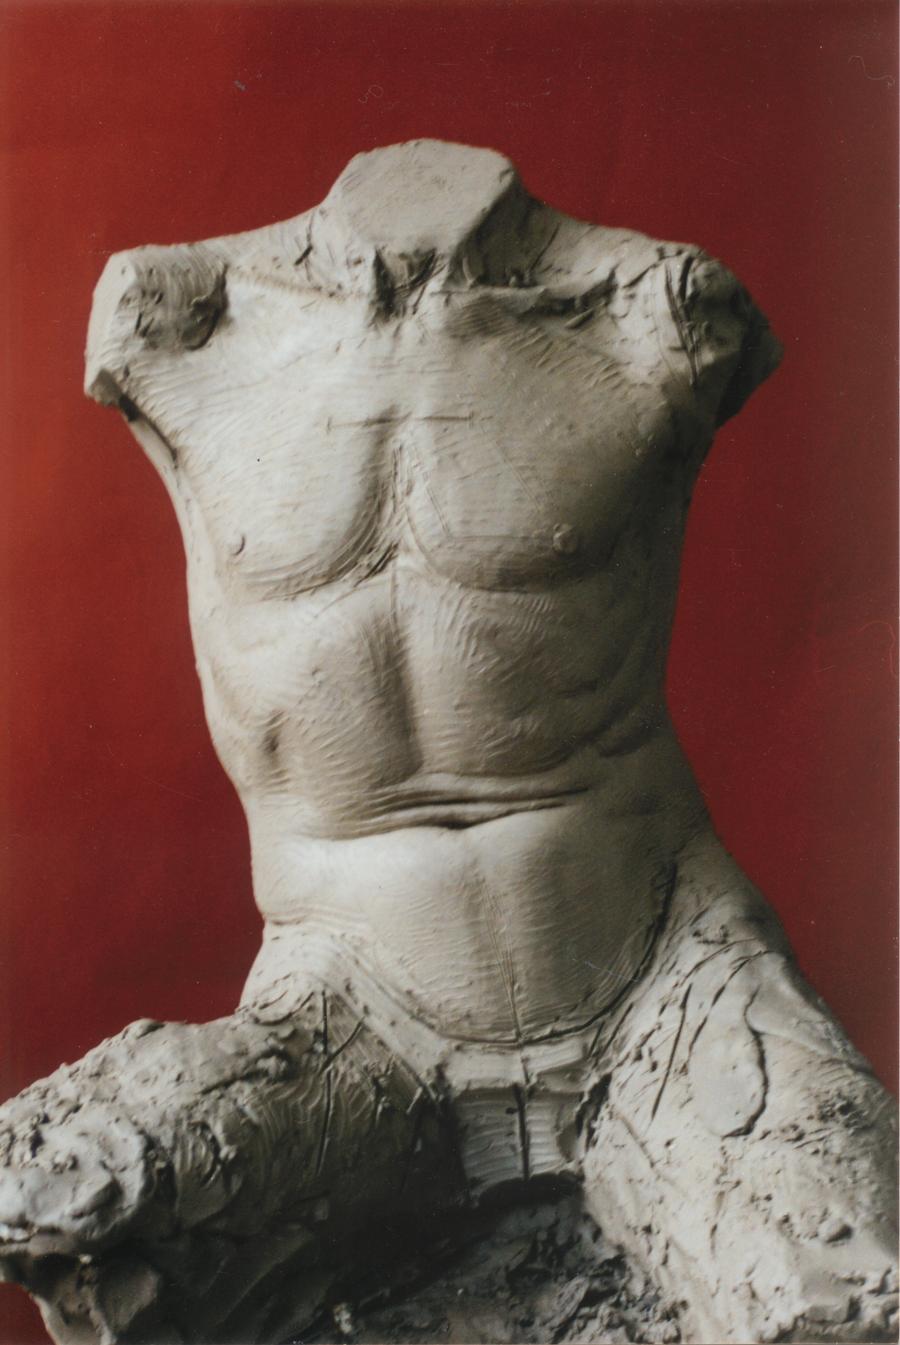 thanasi-torso-study-gianni-sculpture.png